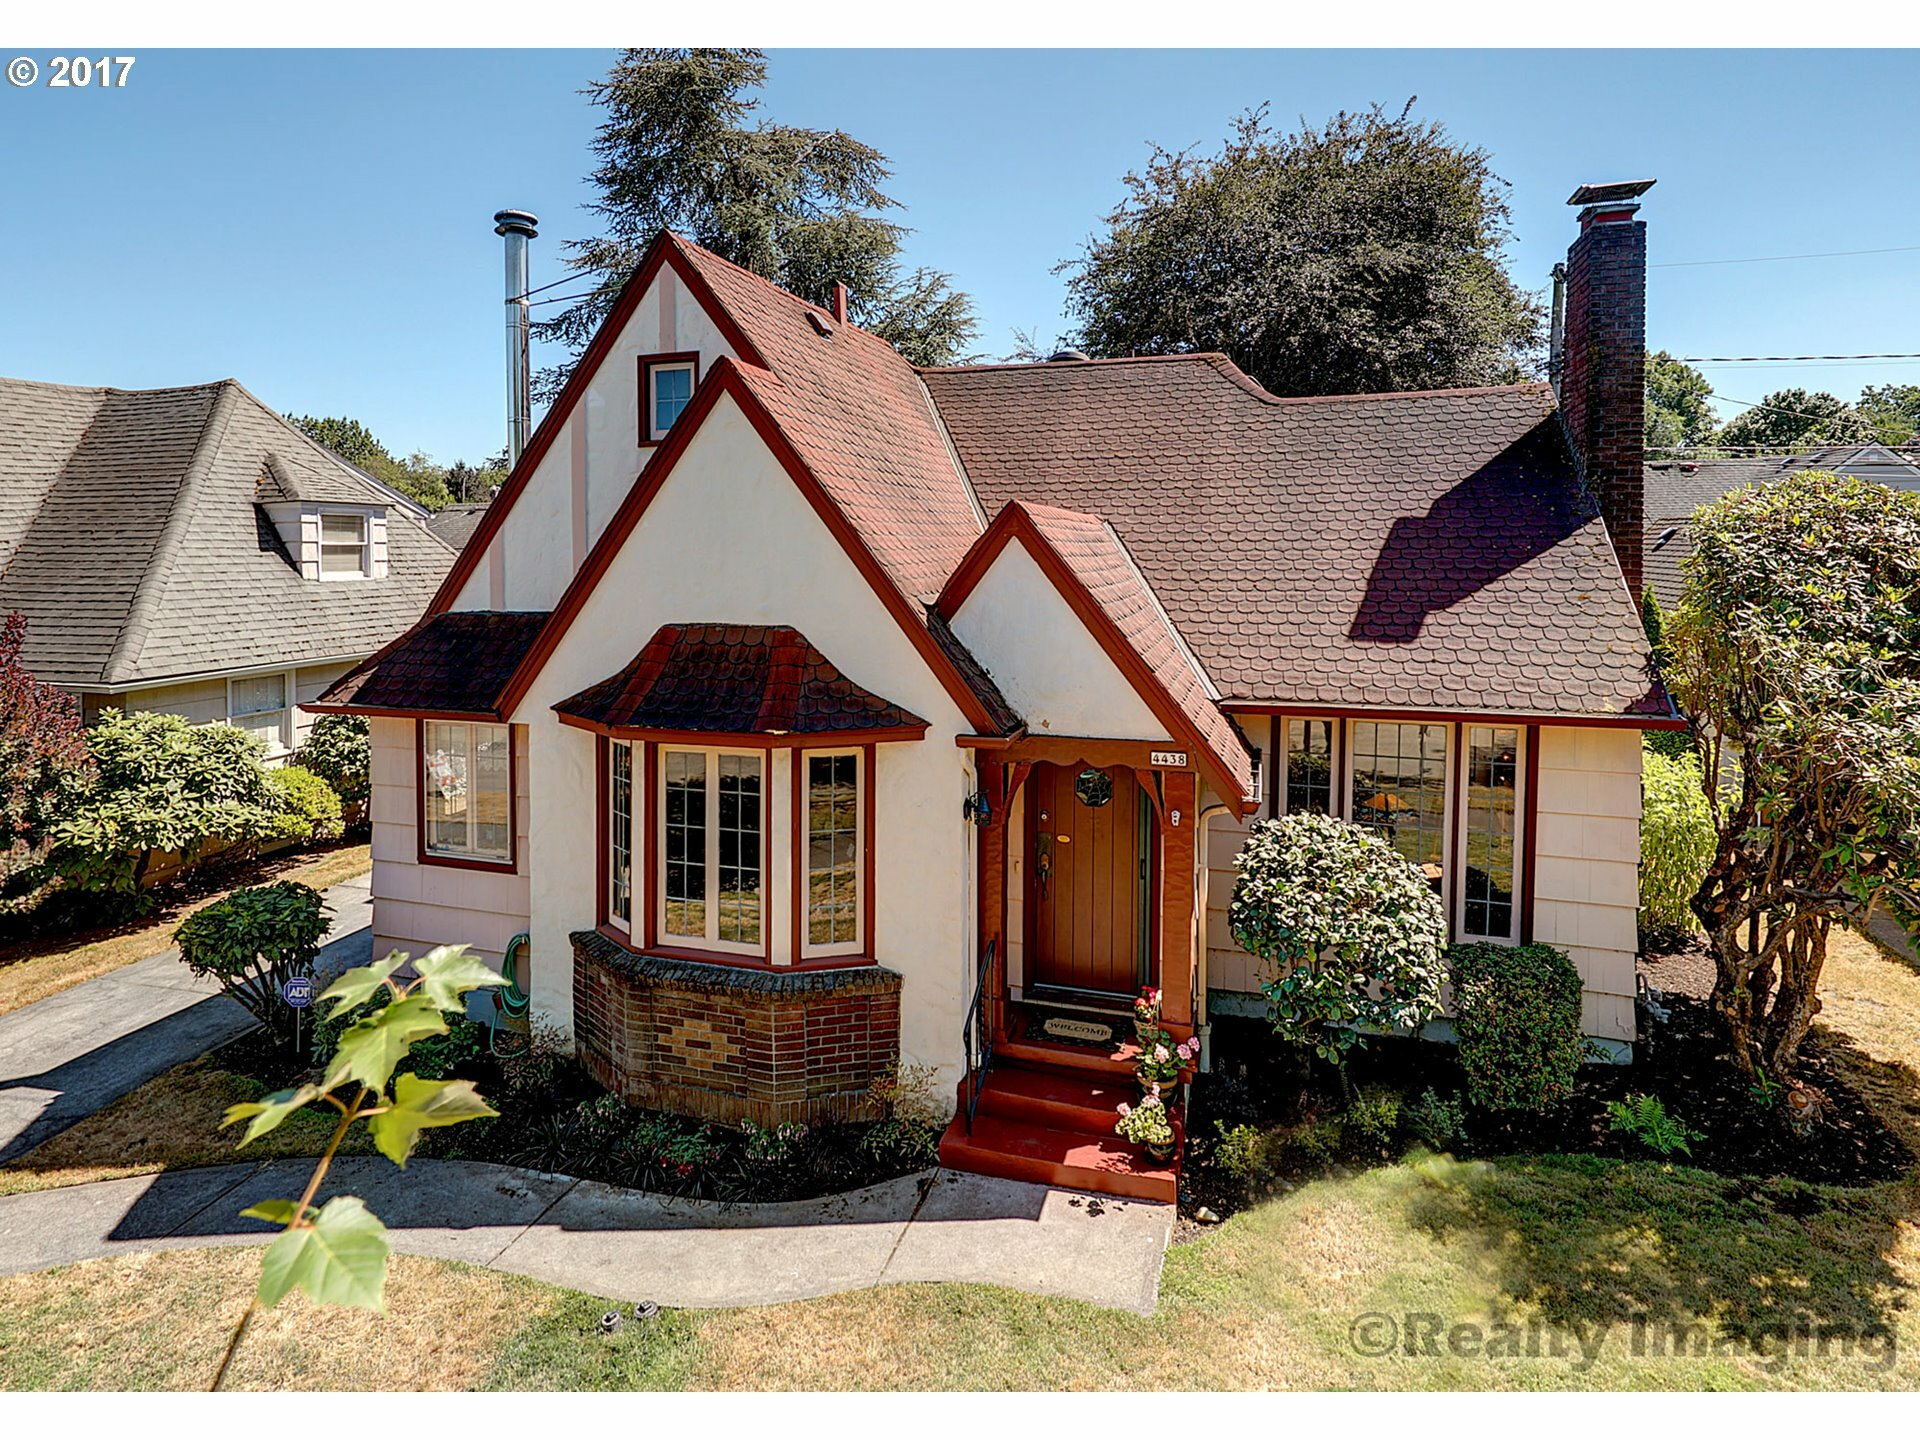 4438 Ne Royal Ct, Portland, OR - USA (photo 1)